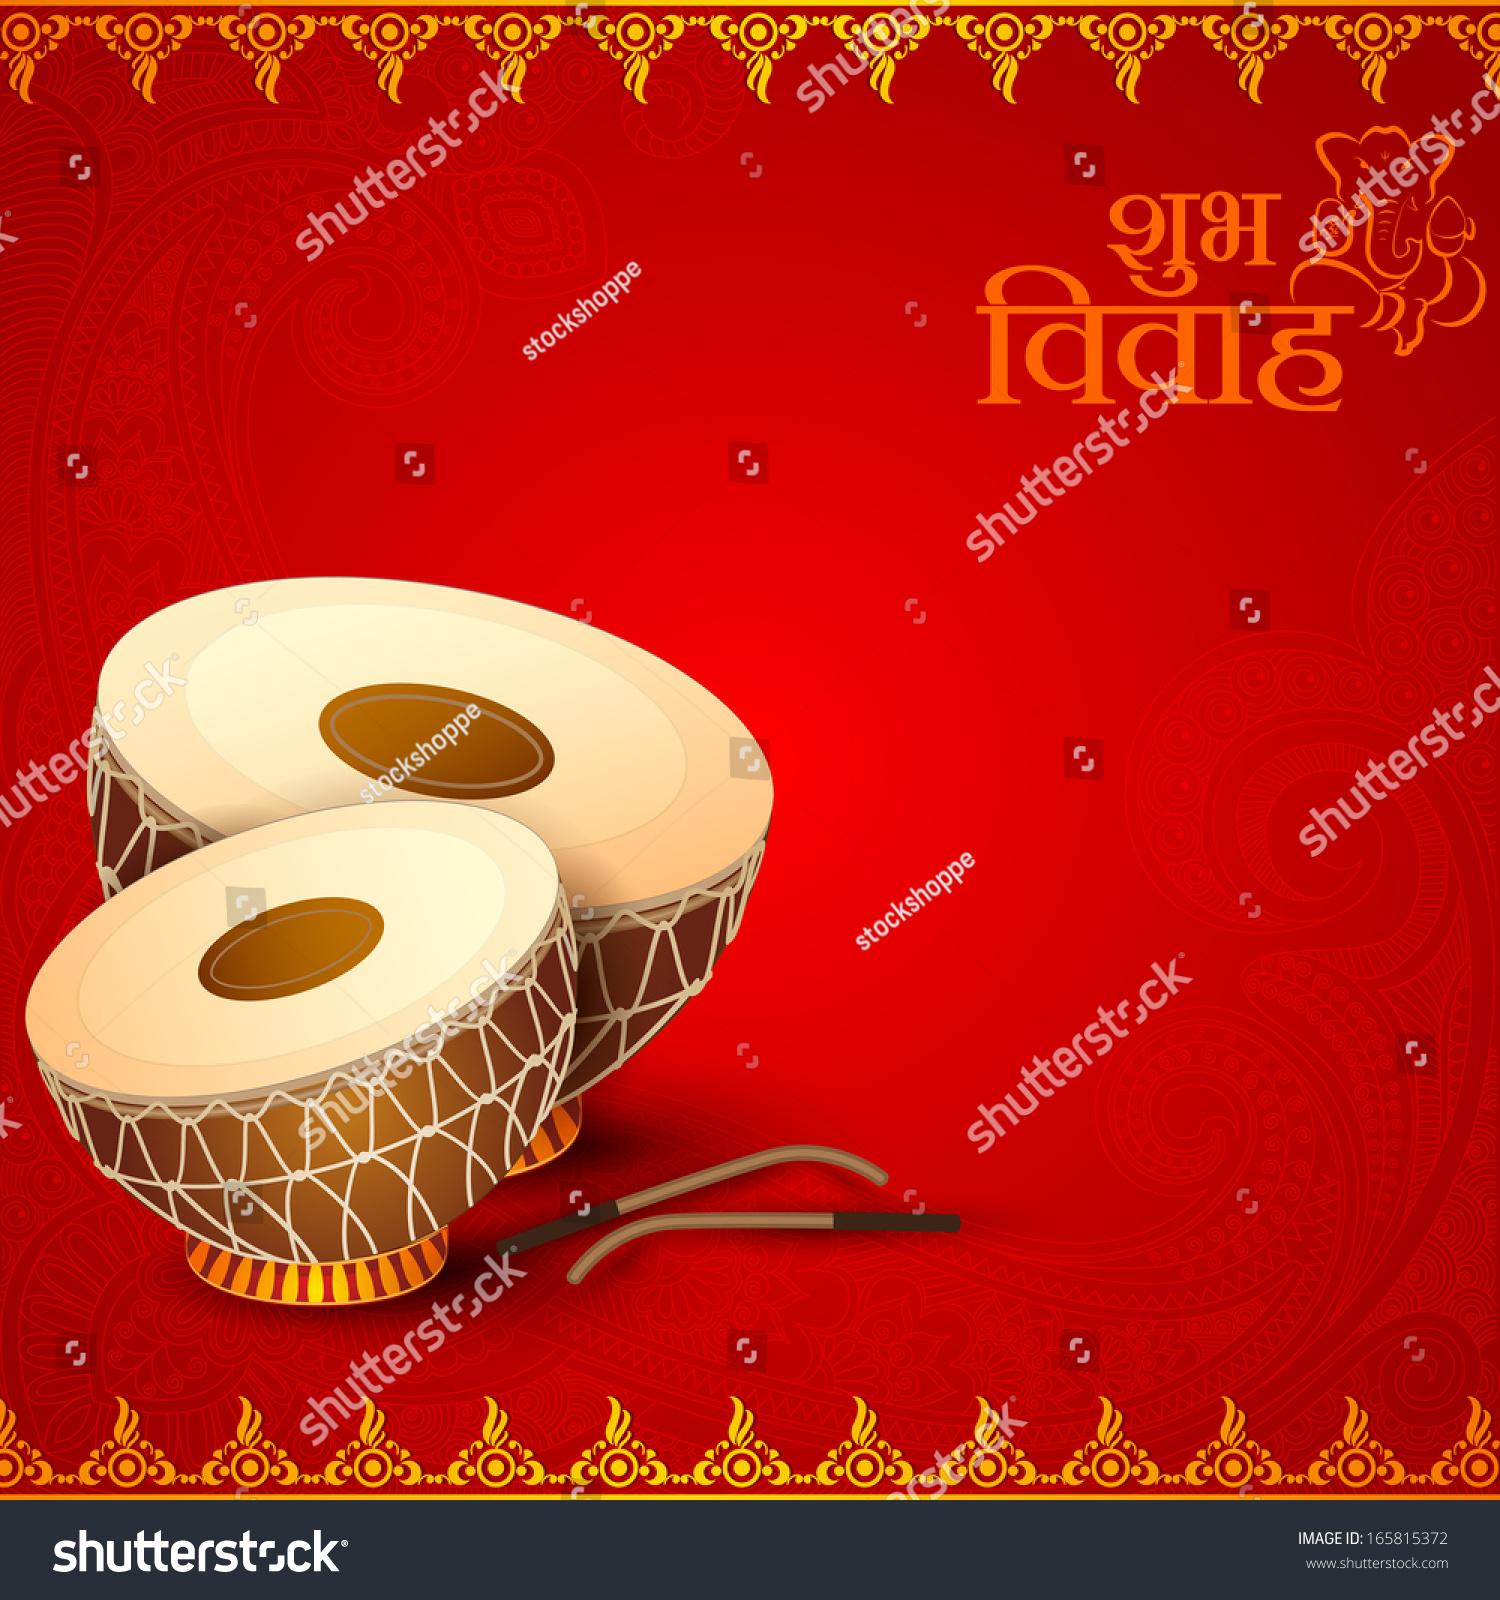 Vector Illustration Drum Indian Wedding Invitation Stock Vector ...